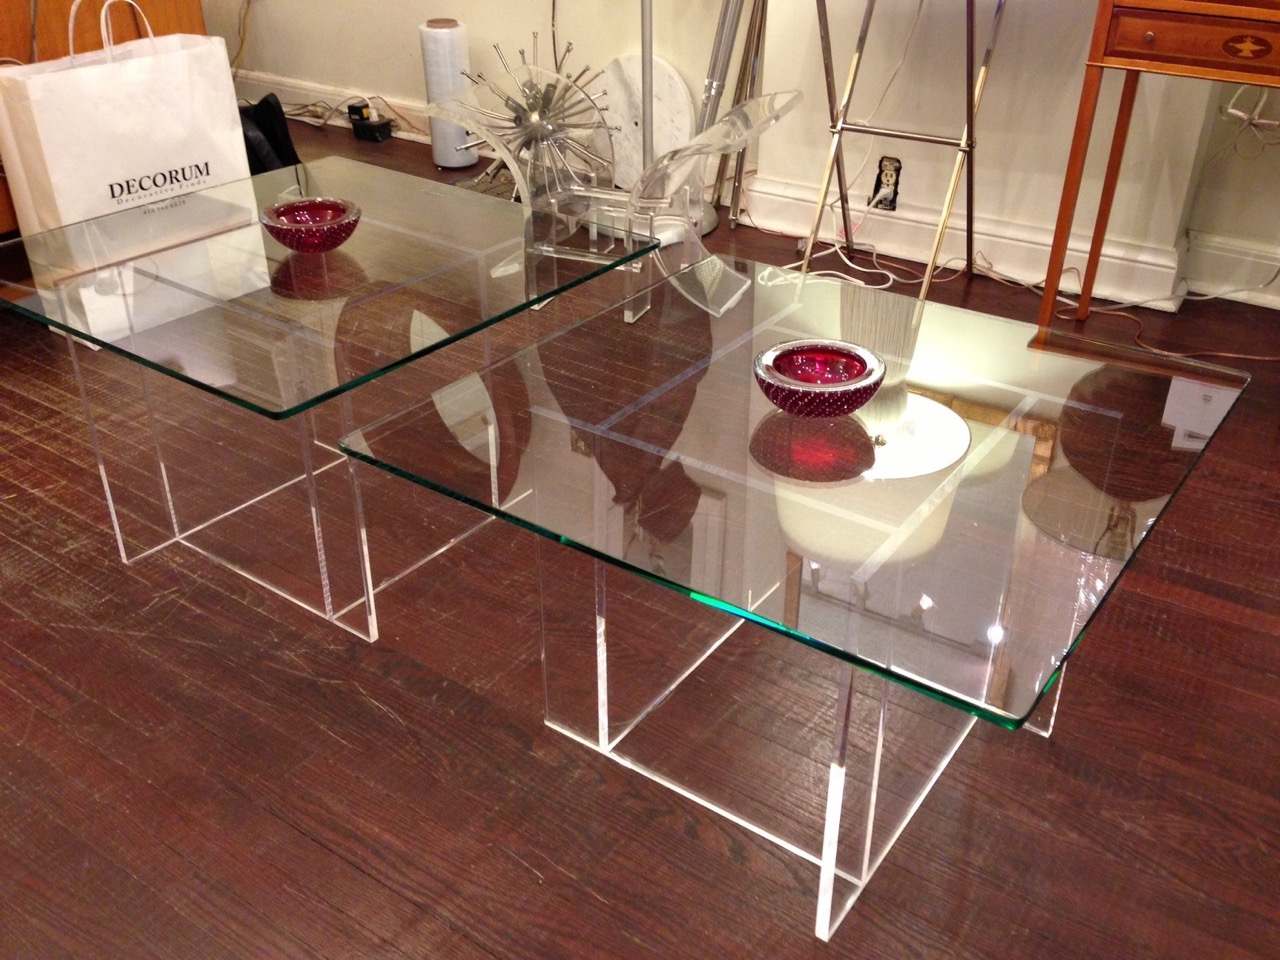 Decorum custom luciteglass cocktail tables.jpeg